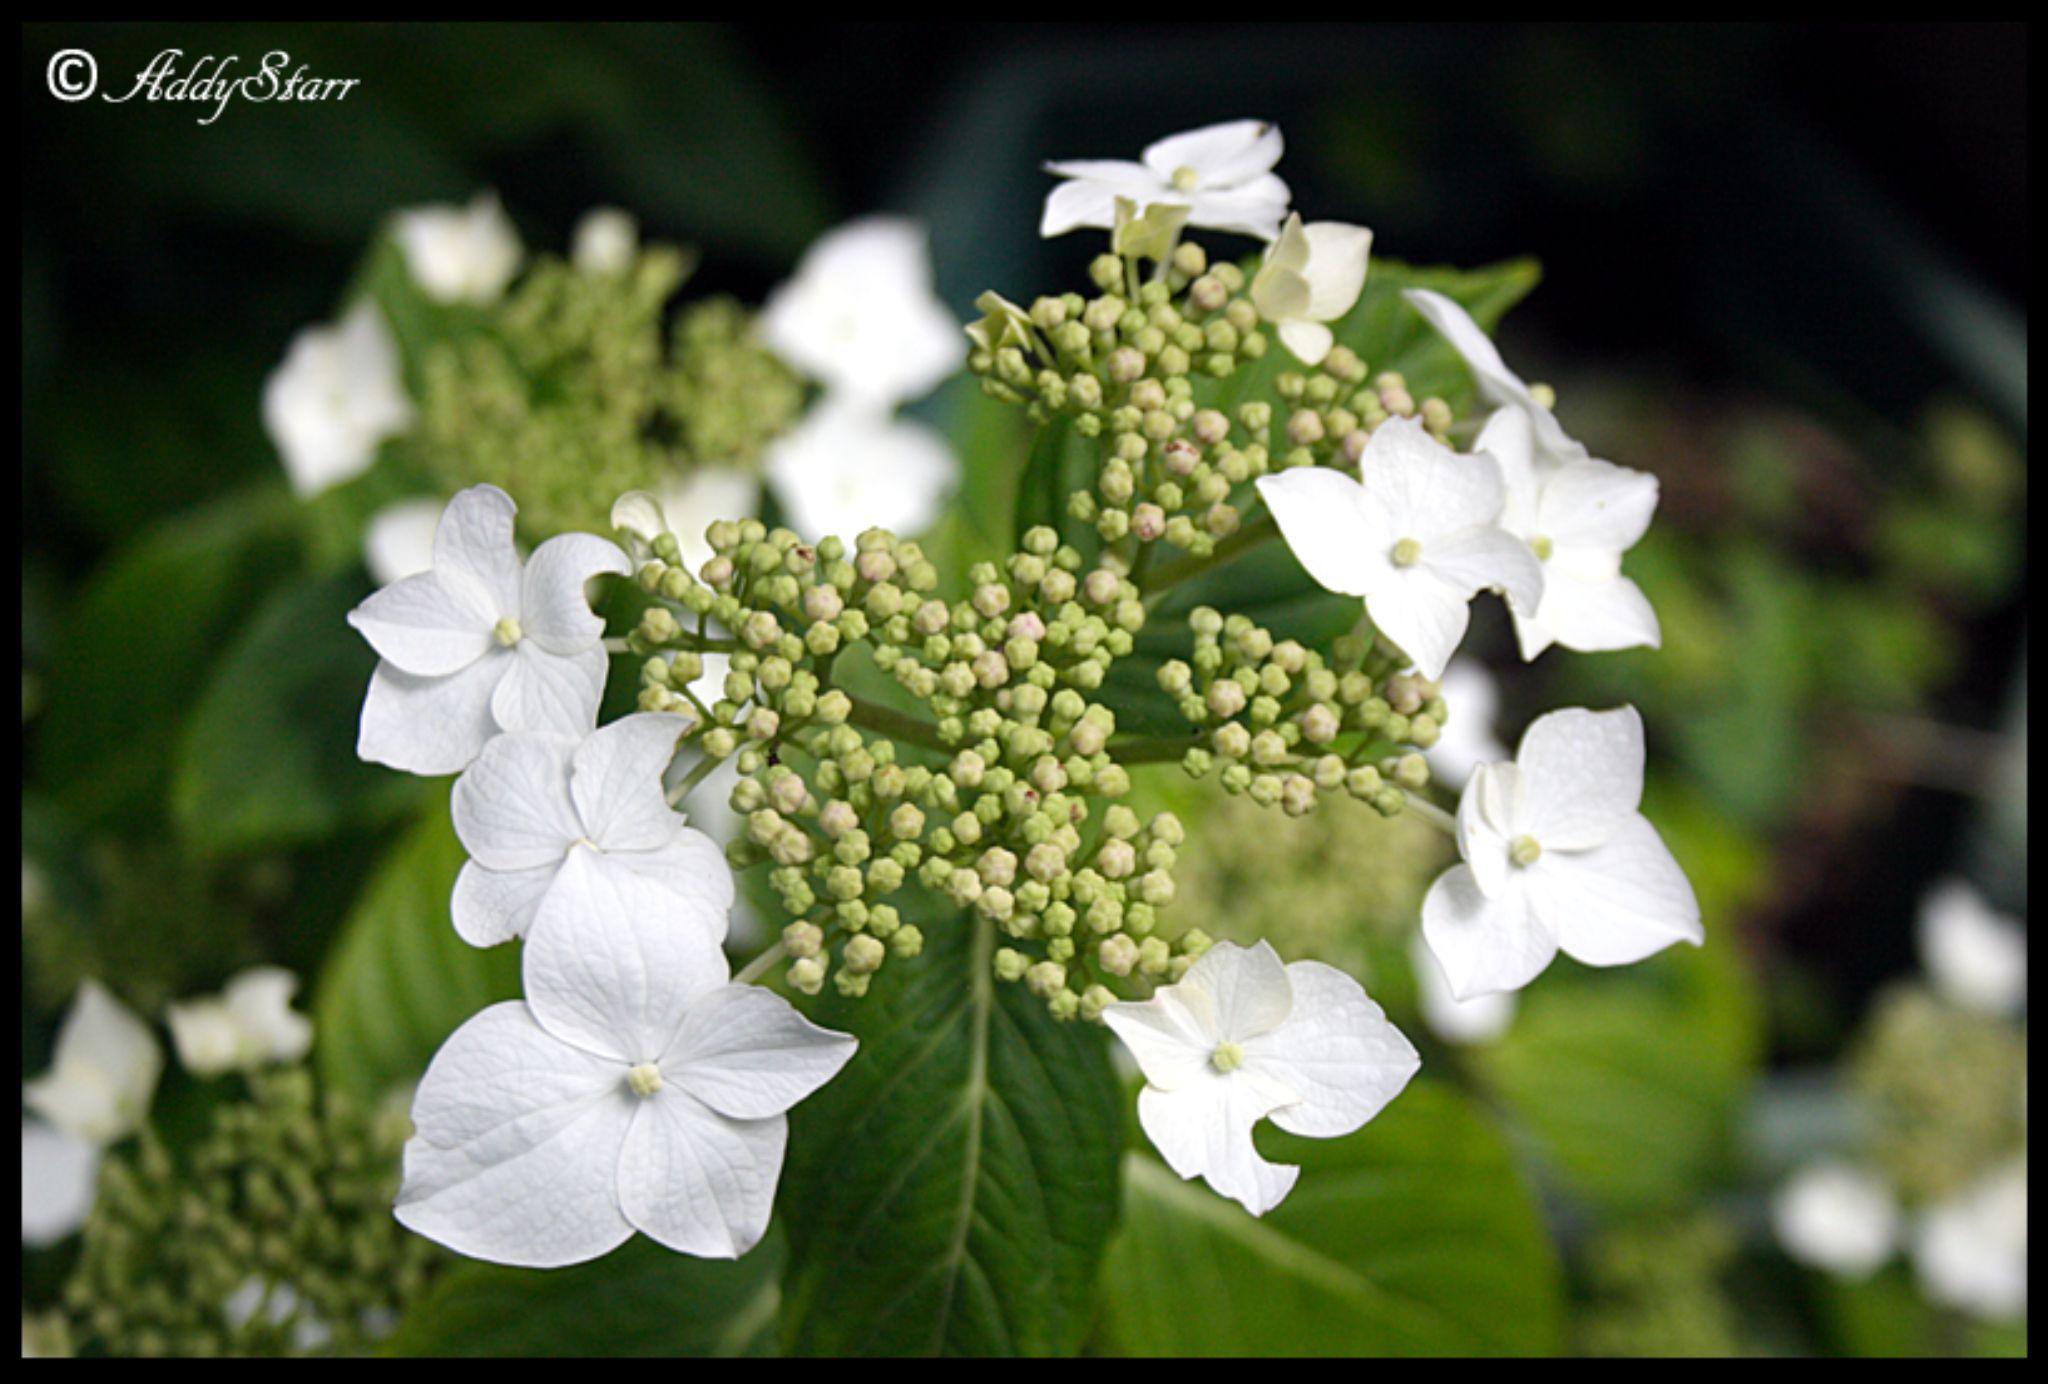 Flowers by Addy Starr